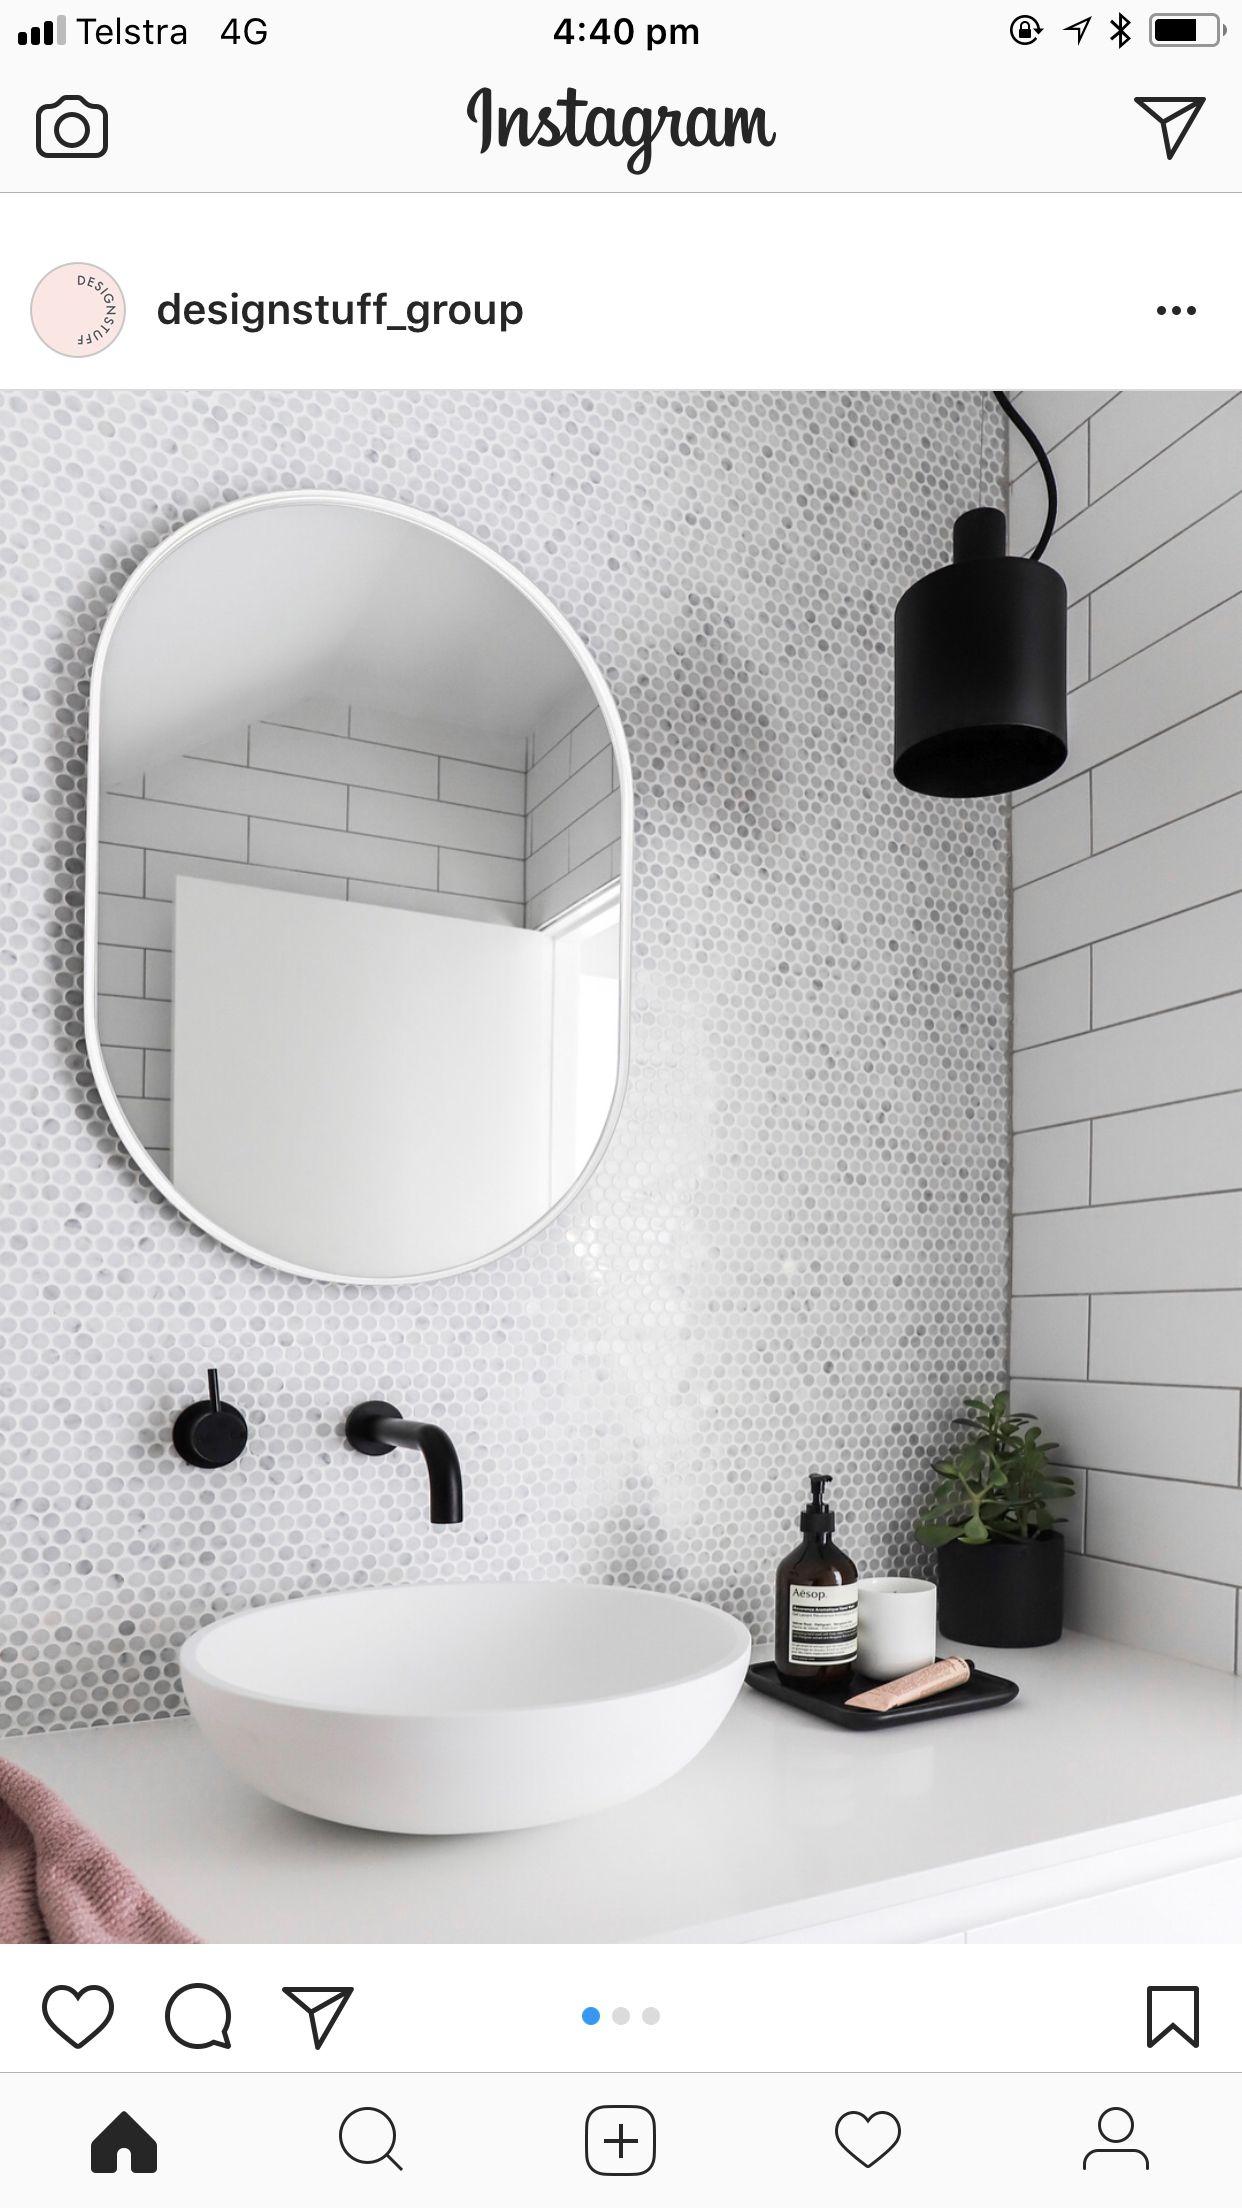 Pin by danielle clarke on new family bathroom pinterest family